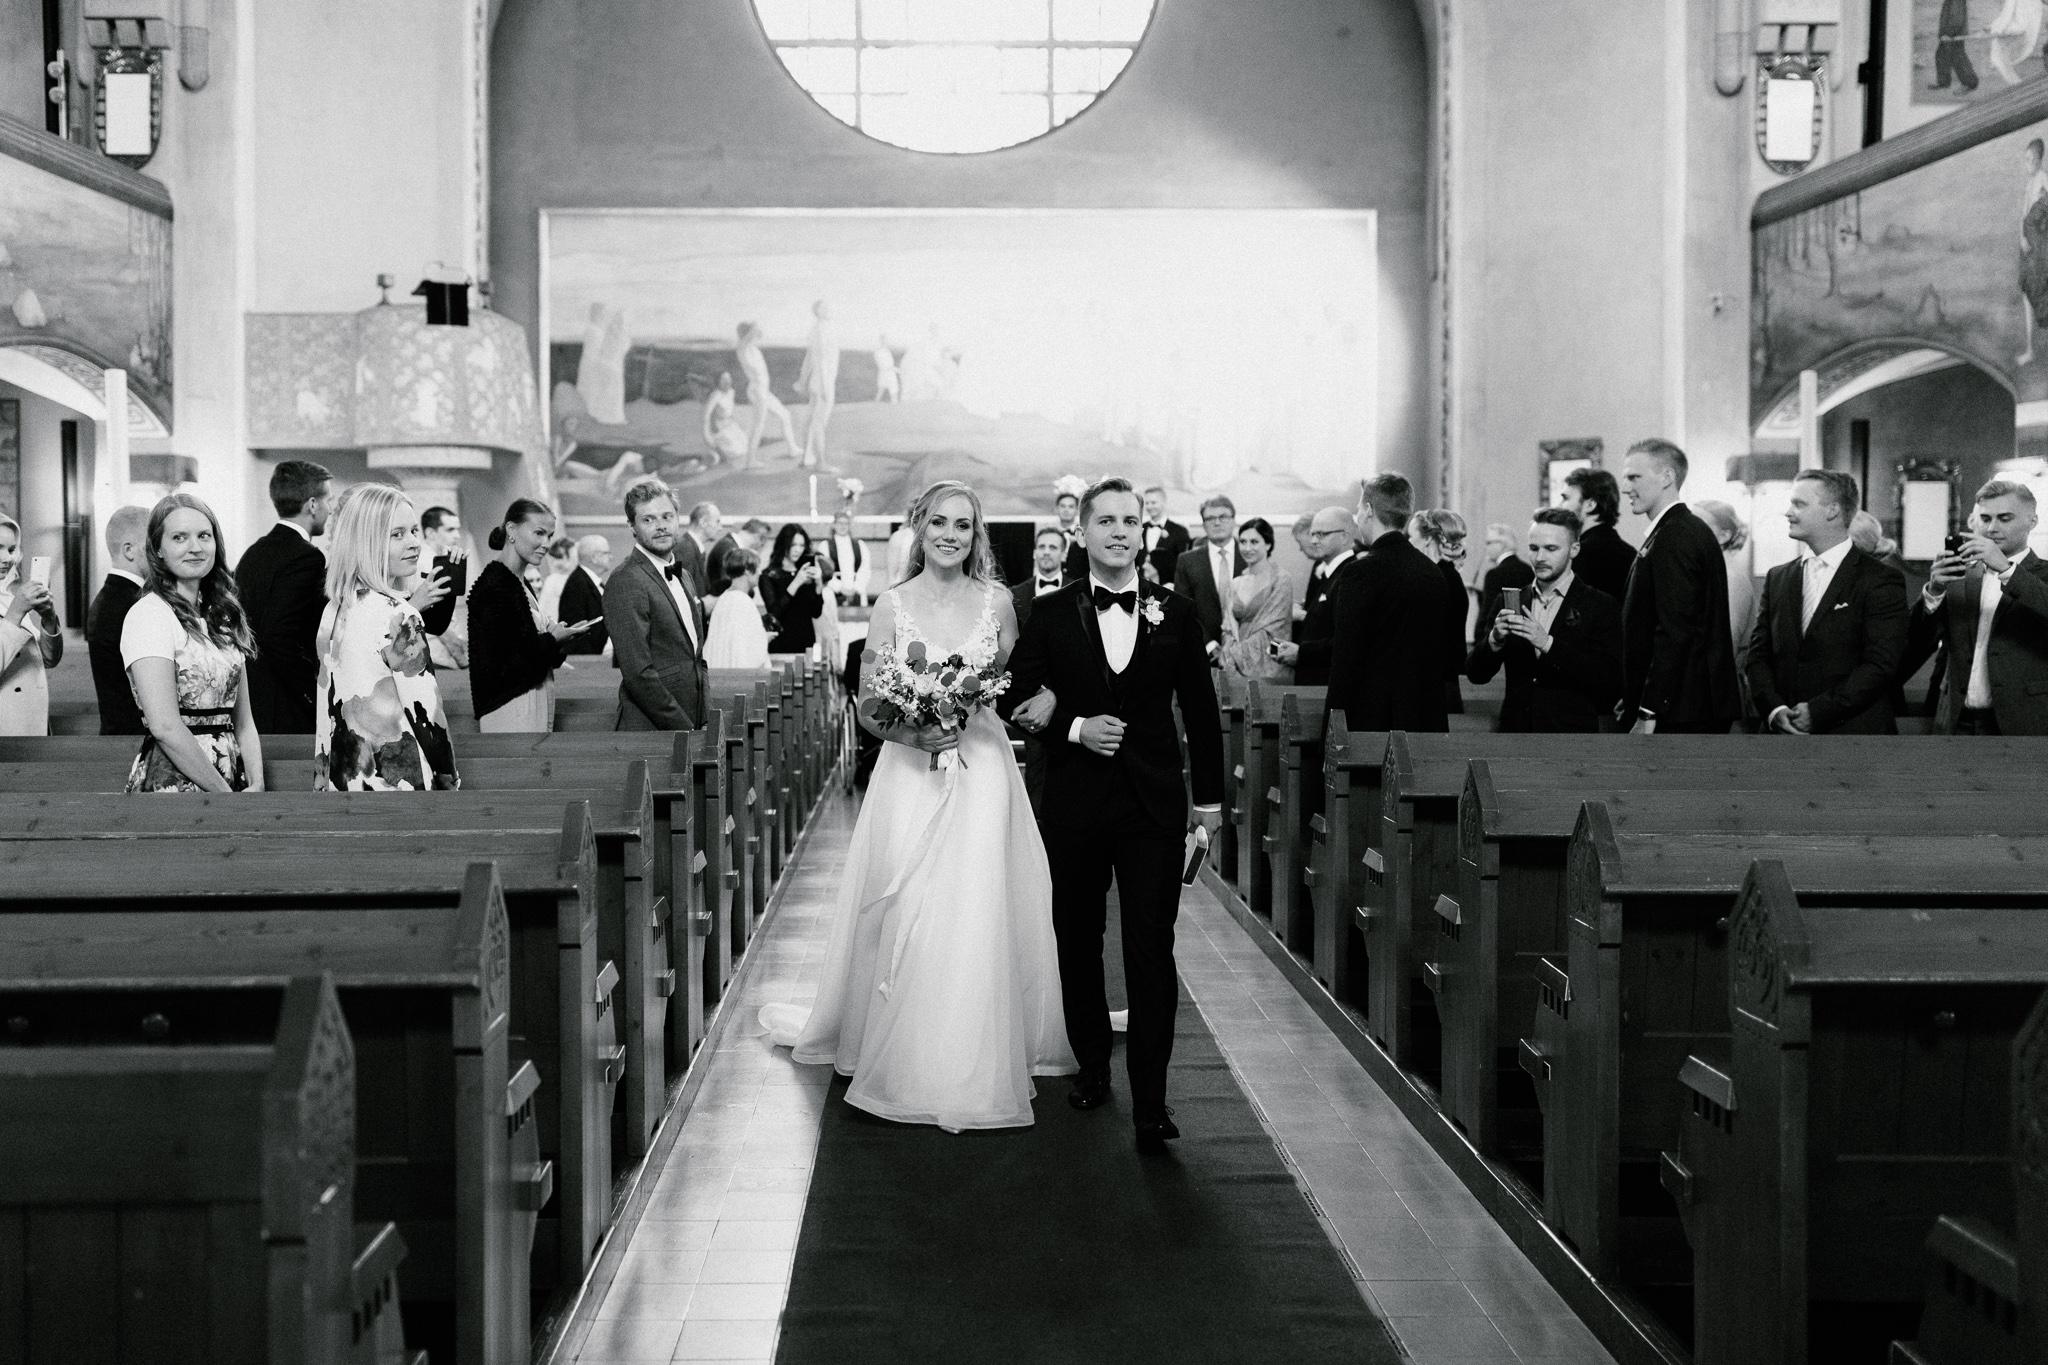 Johanna + Mikko - Tampere - Photo by Patrick Karkkolainen Wedding Photographer-76.jpg